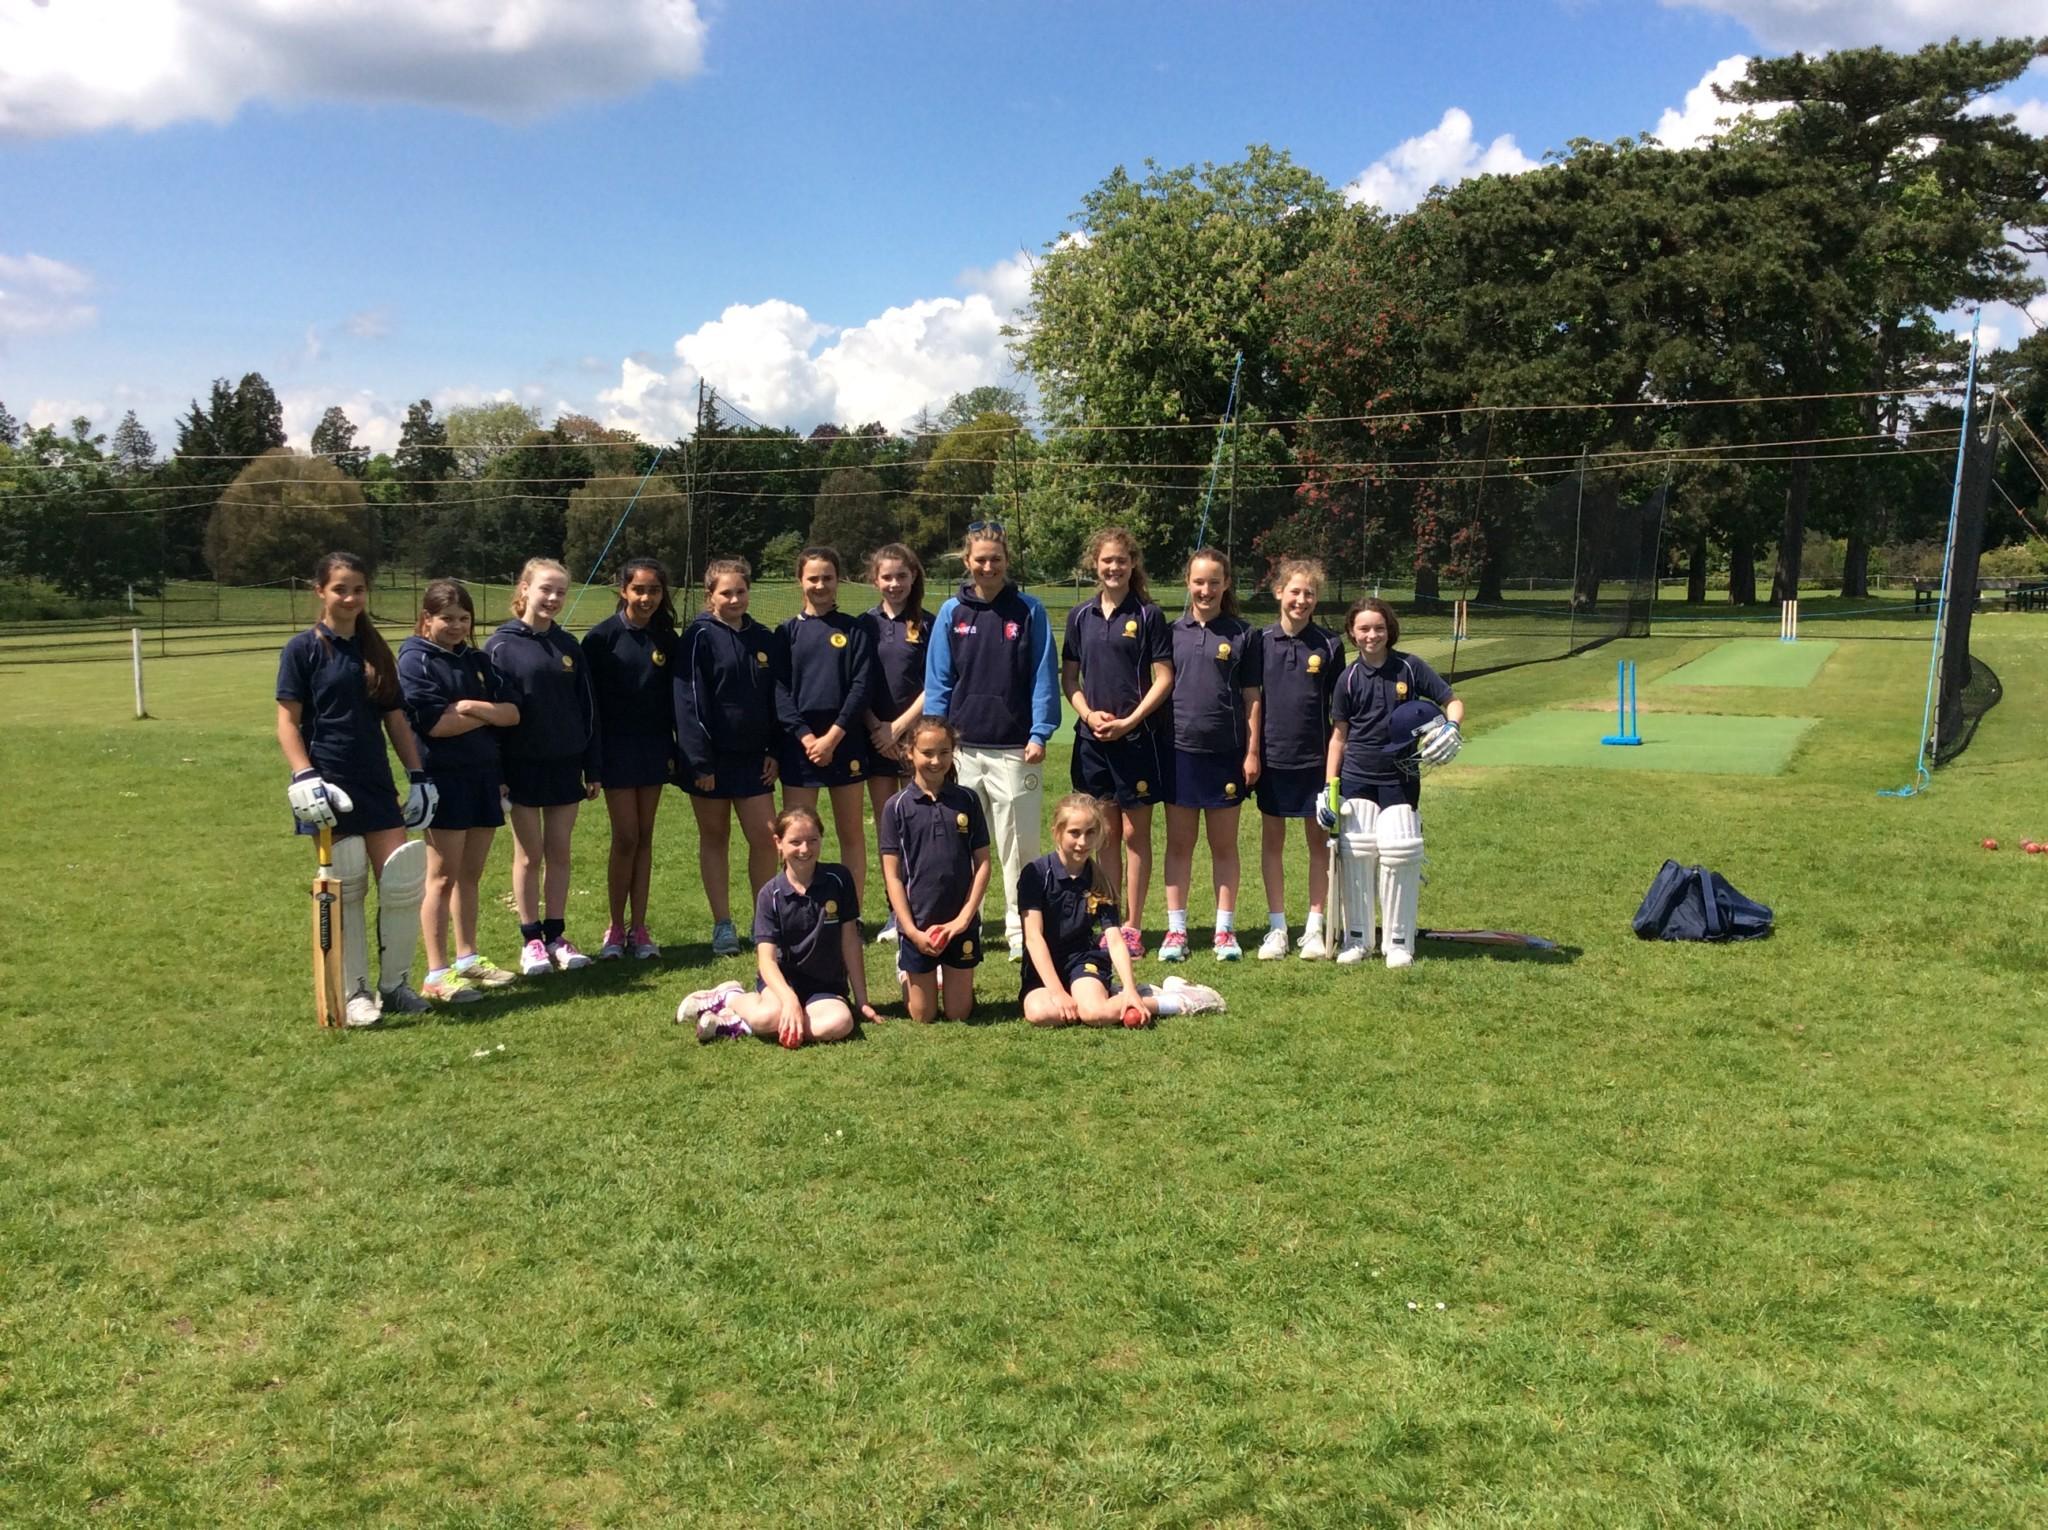 Girls enjoyed some coaching from former England Captain, Charlotte Edwards.